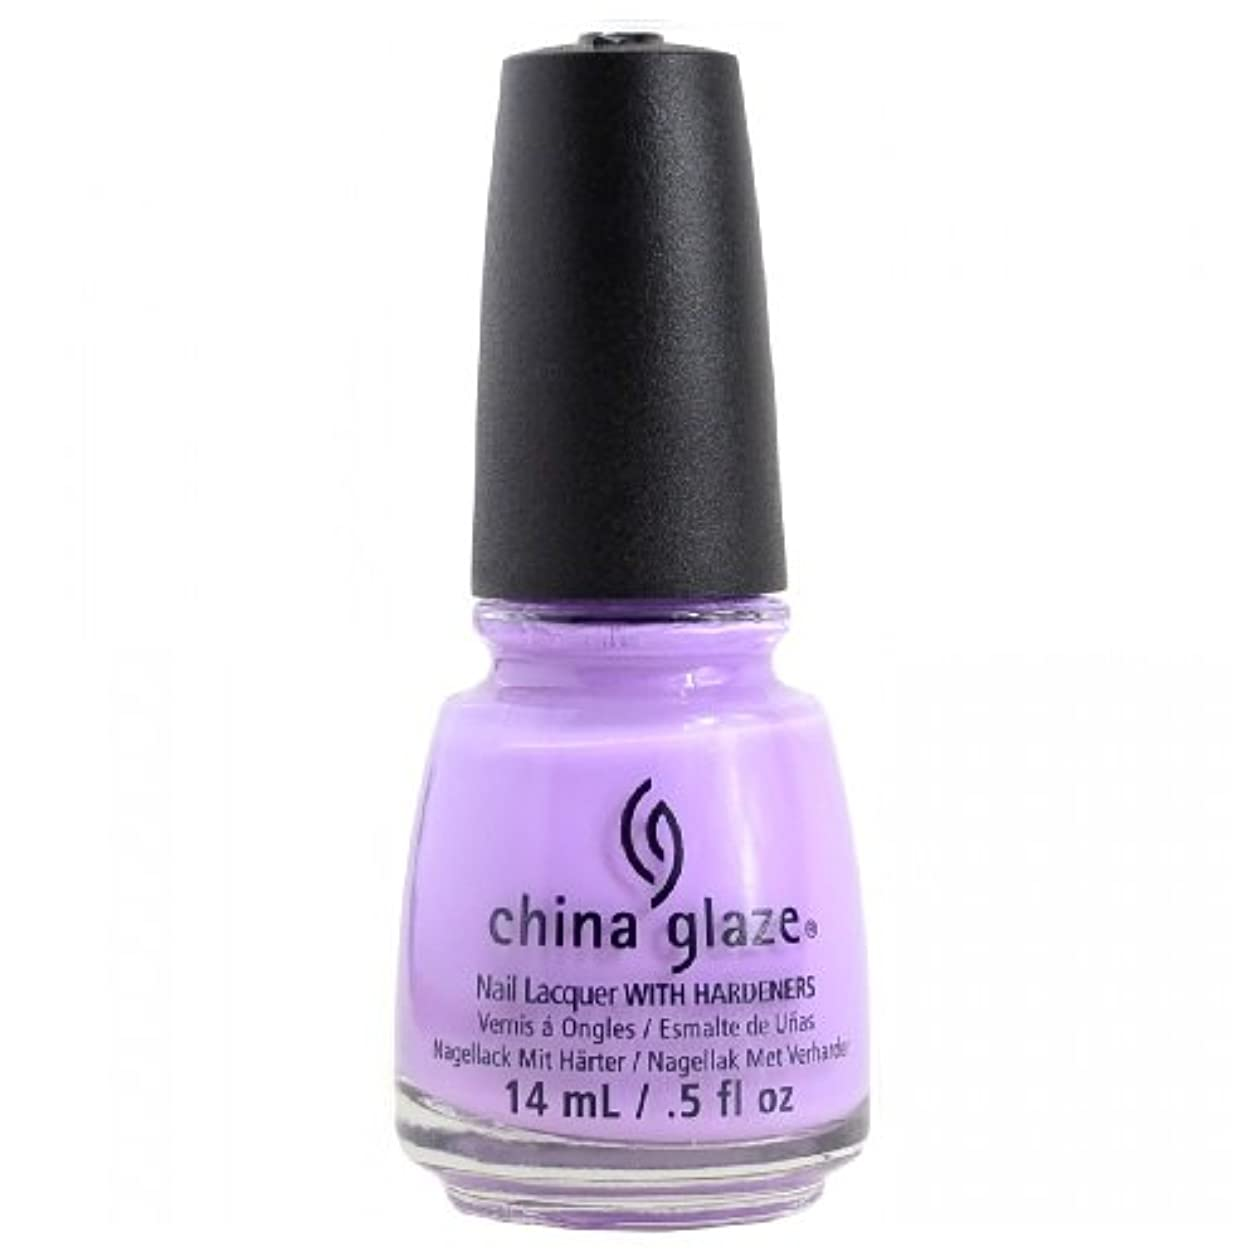 CHINA GLAZE Nail Lacquer - Art City Flourish - Lotus Begin